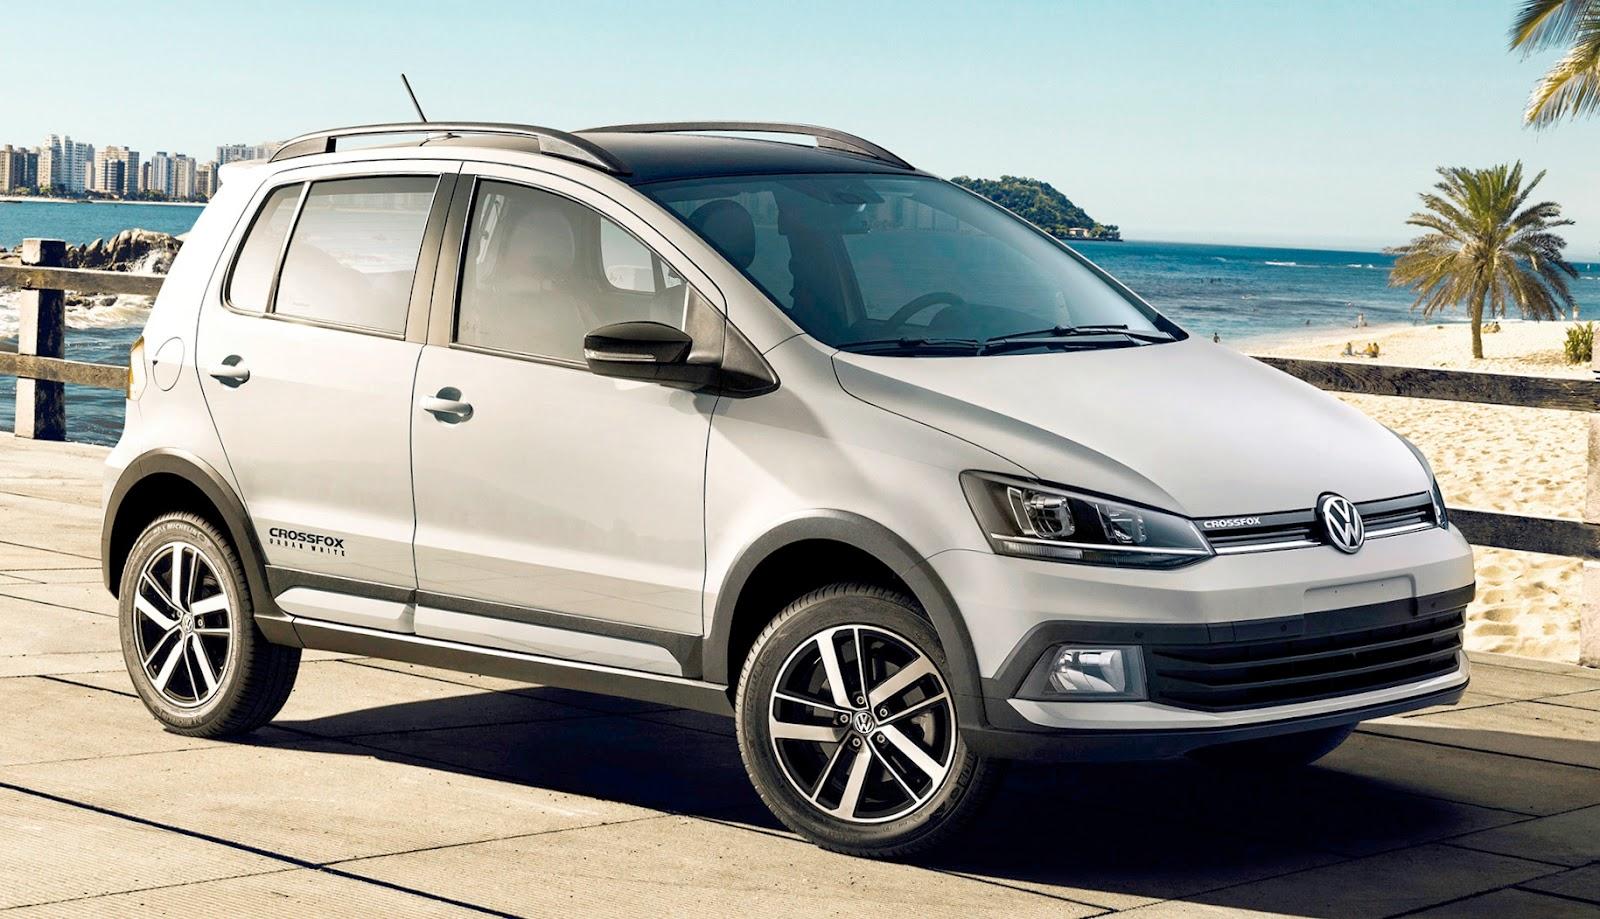 Volkswagen CrossFox Urban White chega com robustez, design exclusivo e novas tecnologias